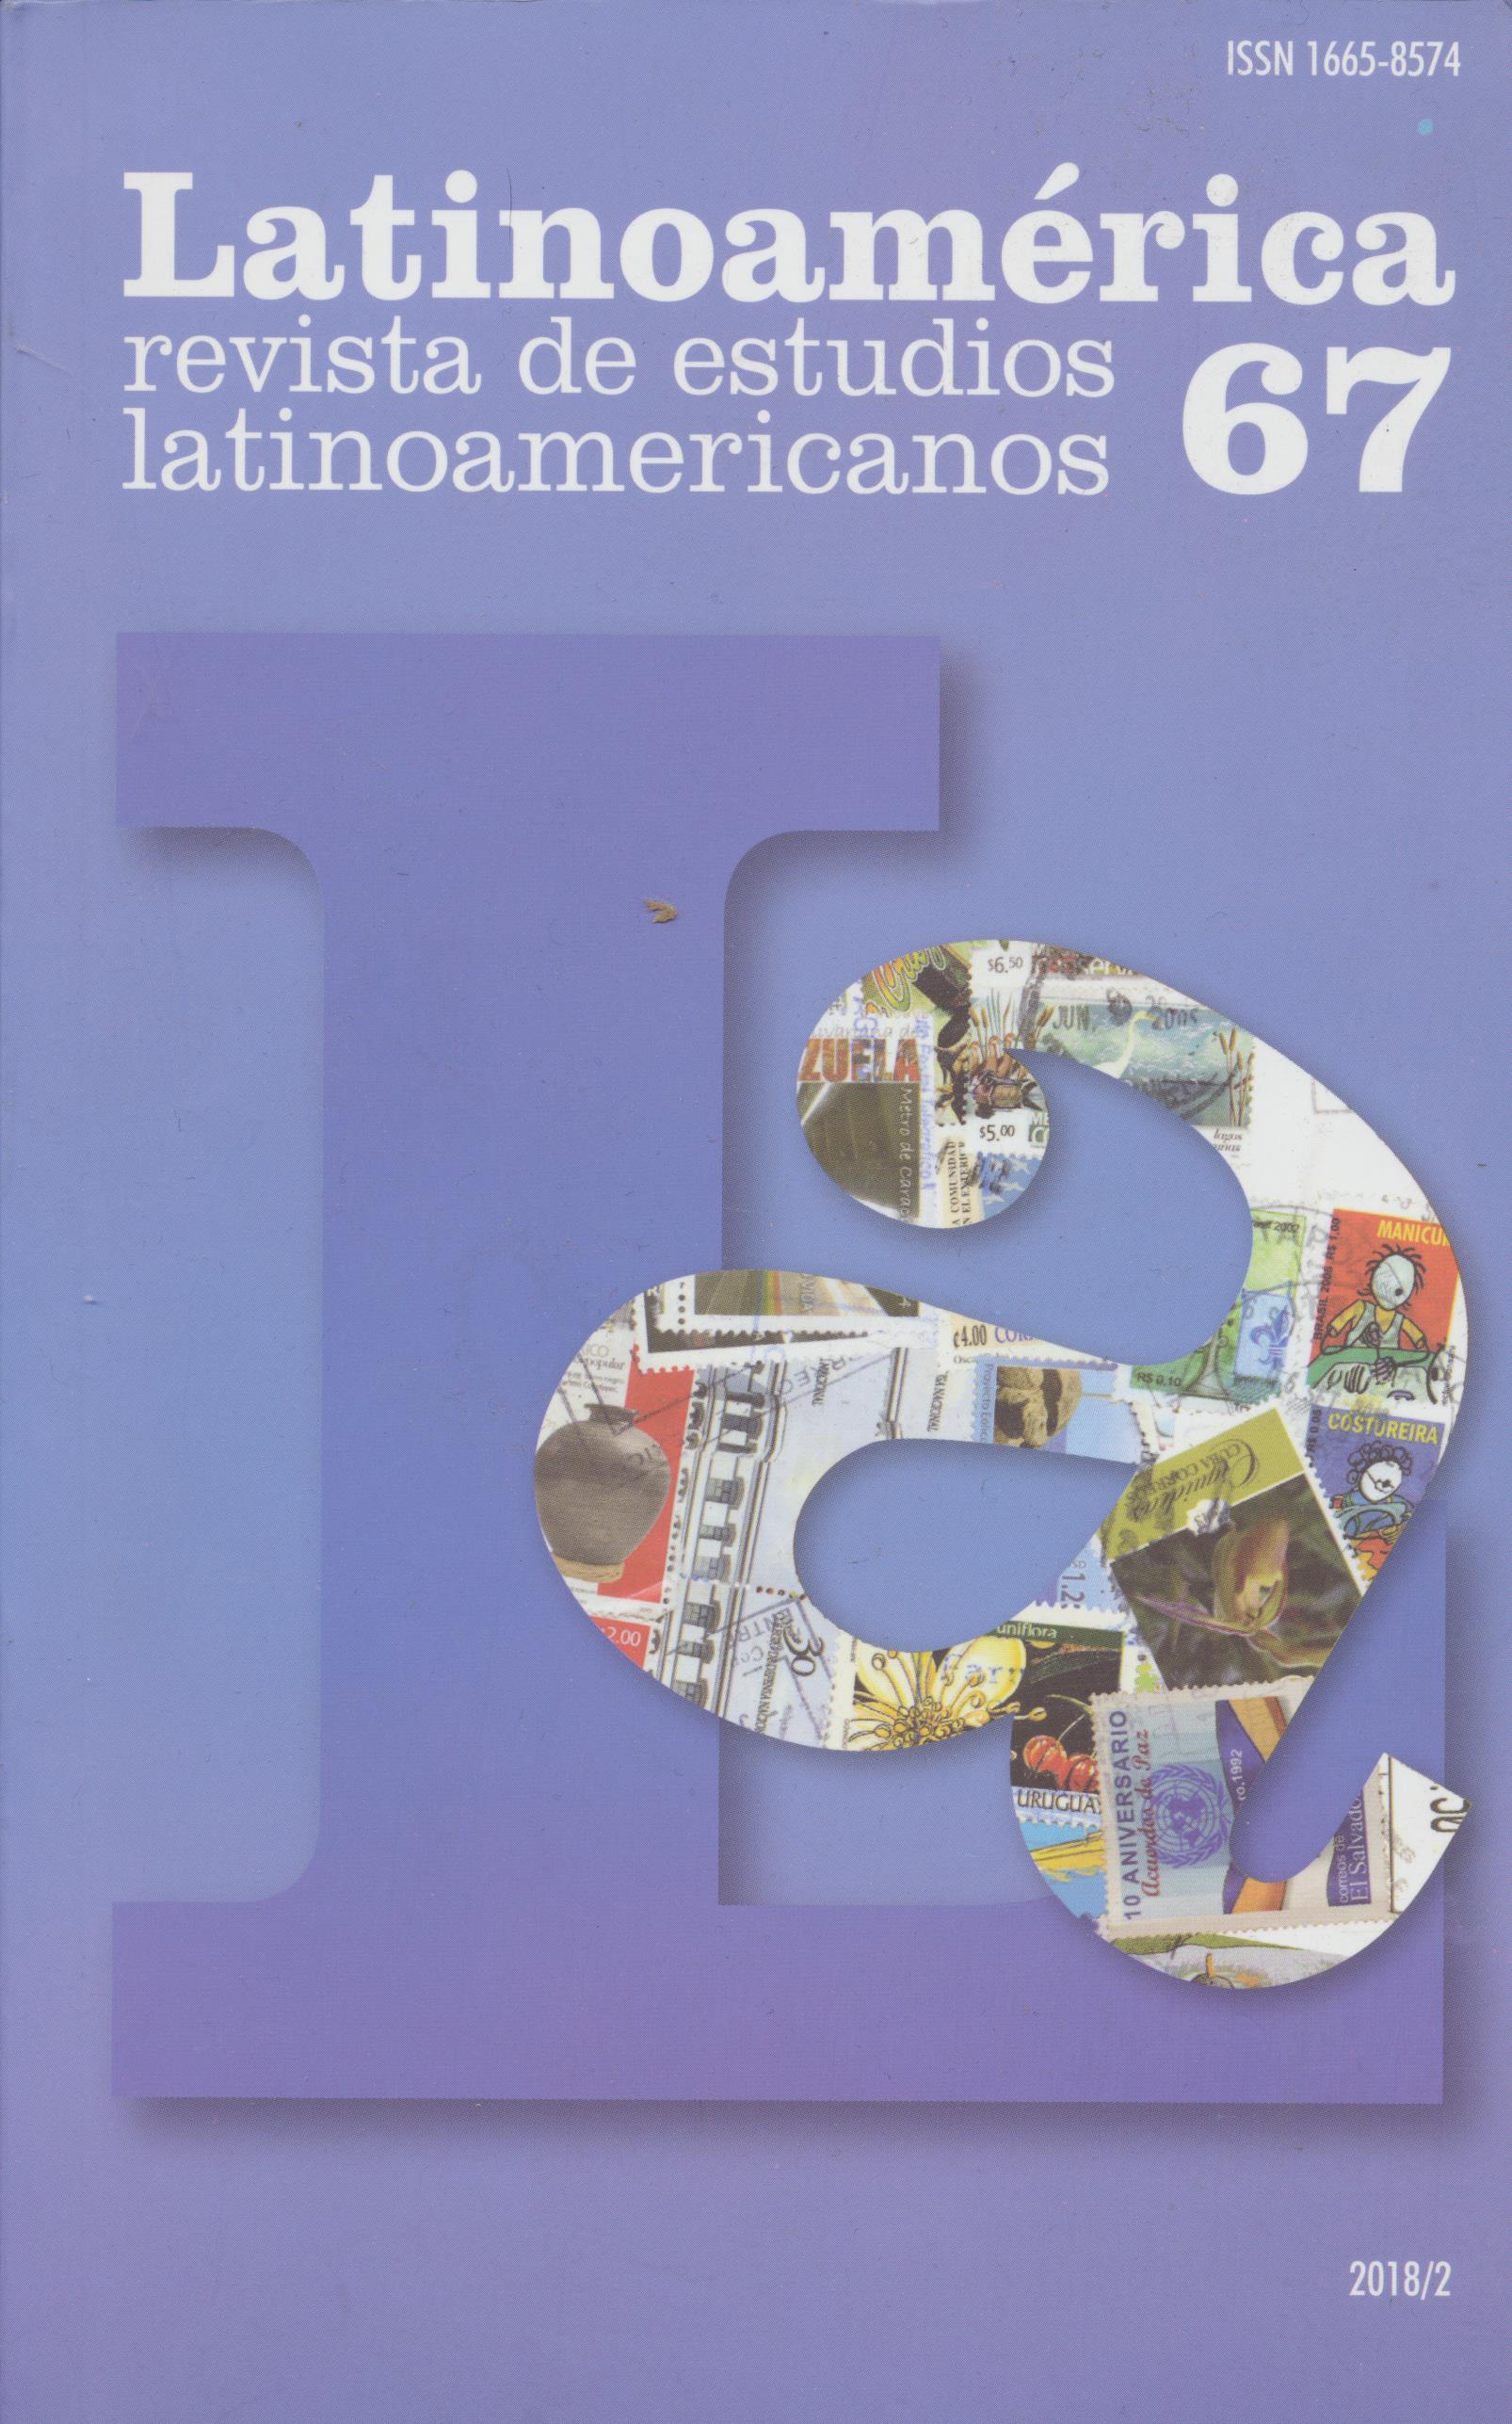 Latinoamérica. Revista de estudios latinoamericanos, núm. 67, julio-diciembre, 2018